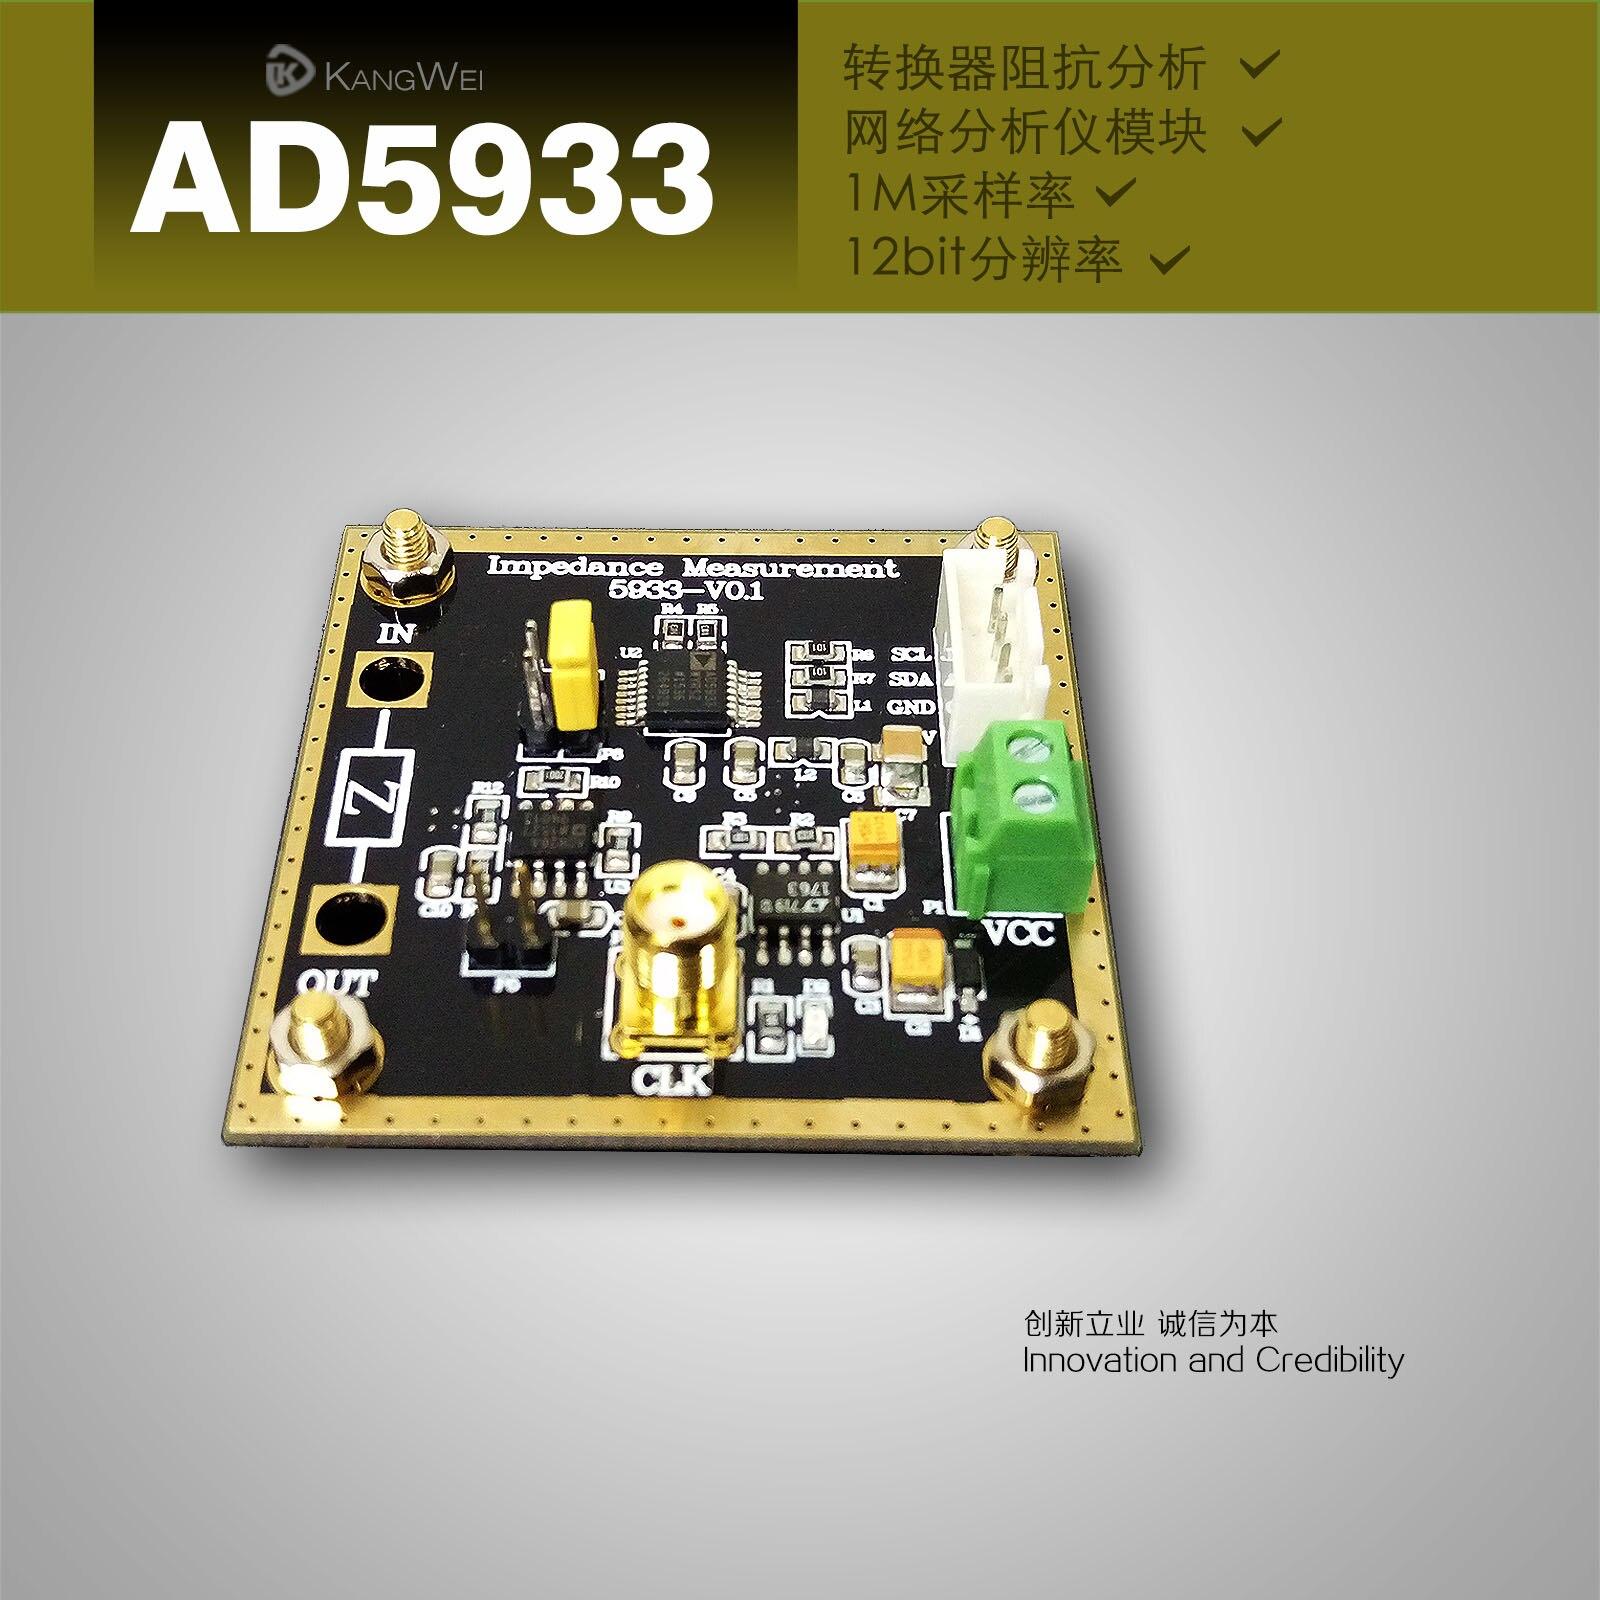 AD5933 impedance converter, network analyzer module, 1M sampling rate, 12bit resolution, measuring resistance dn19 manual sanitary aseptic sampling valve